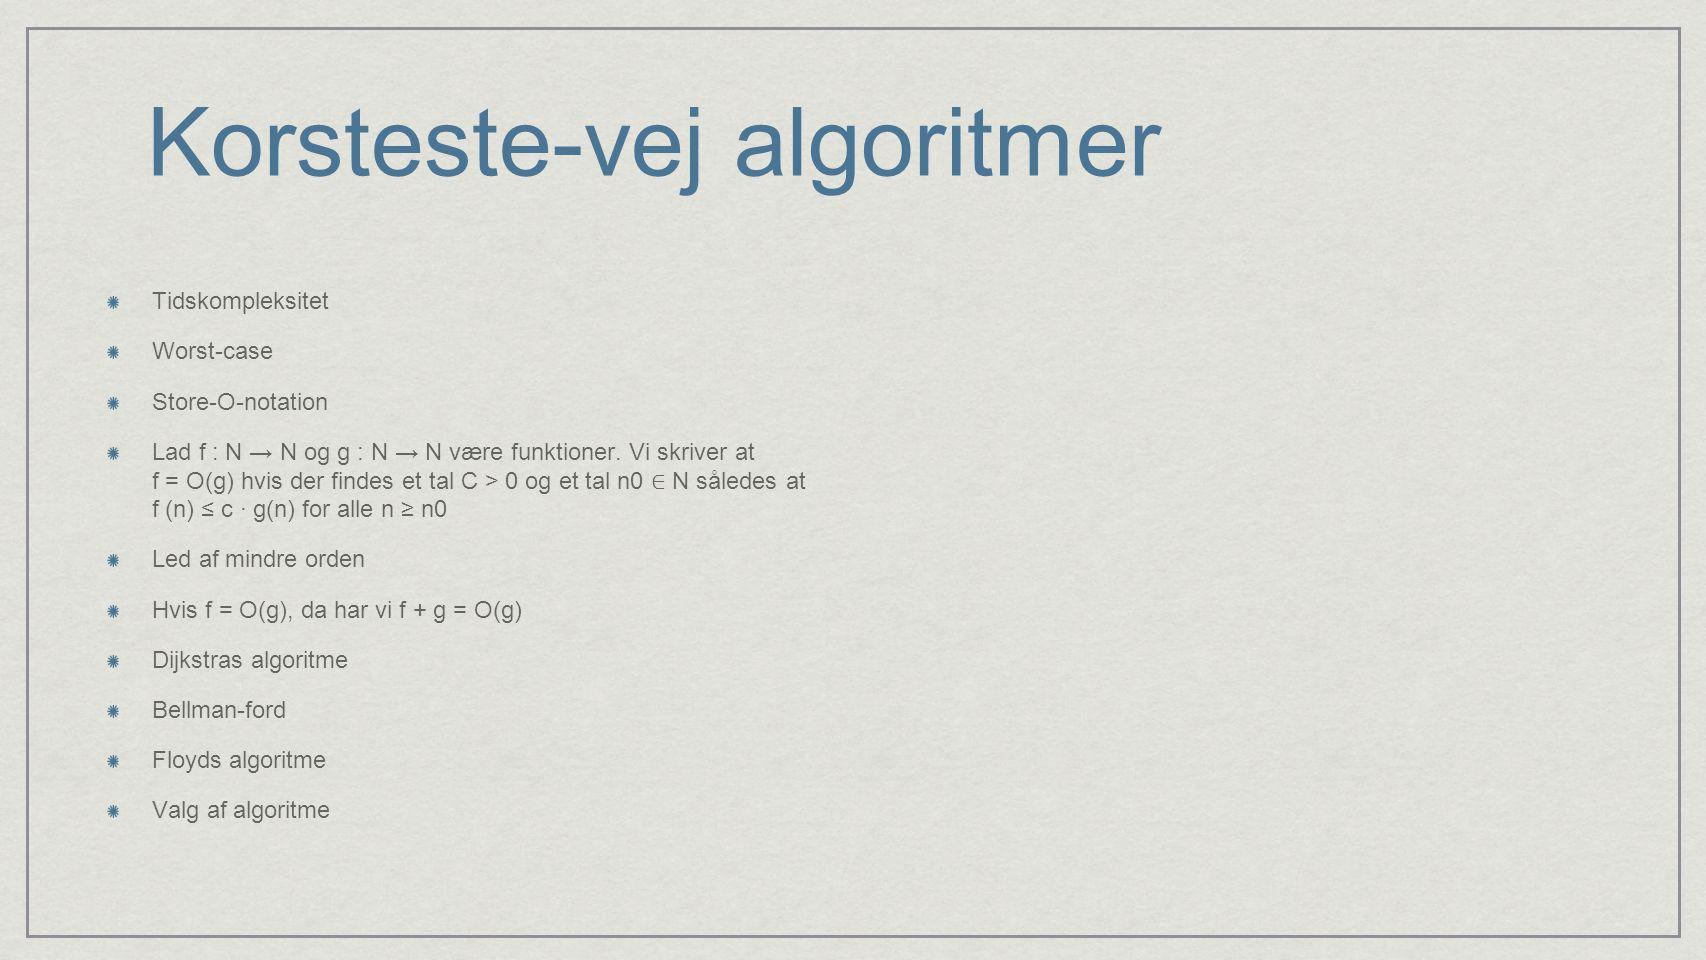 Korsteste-vej algoritmer Tidskompleksitet Worst-case Store-O-notation Lad f : N → N og g : N → N være funktioner.